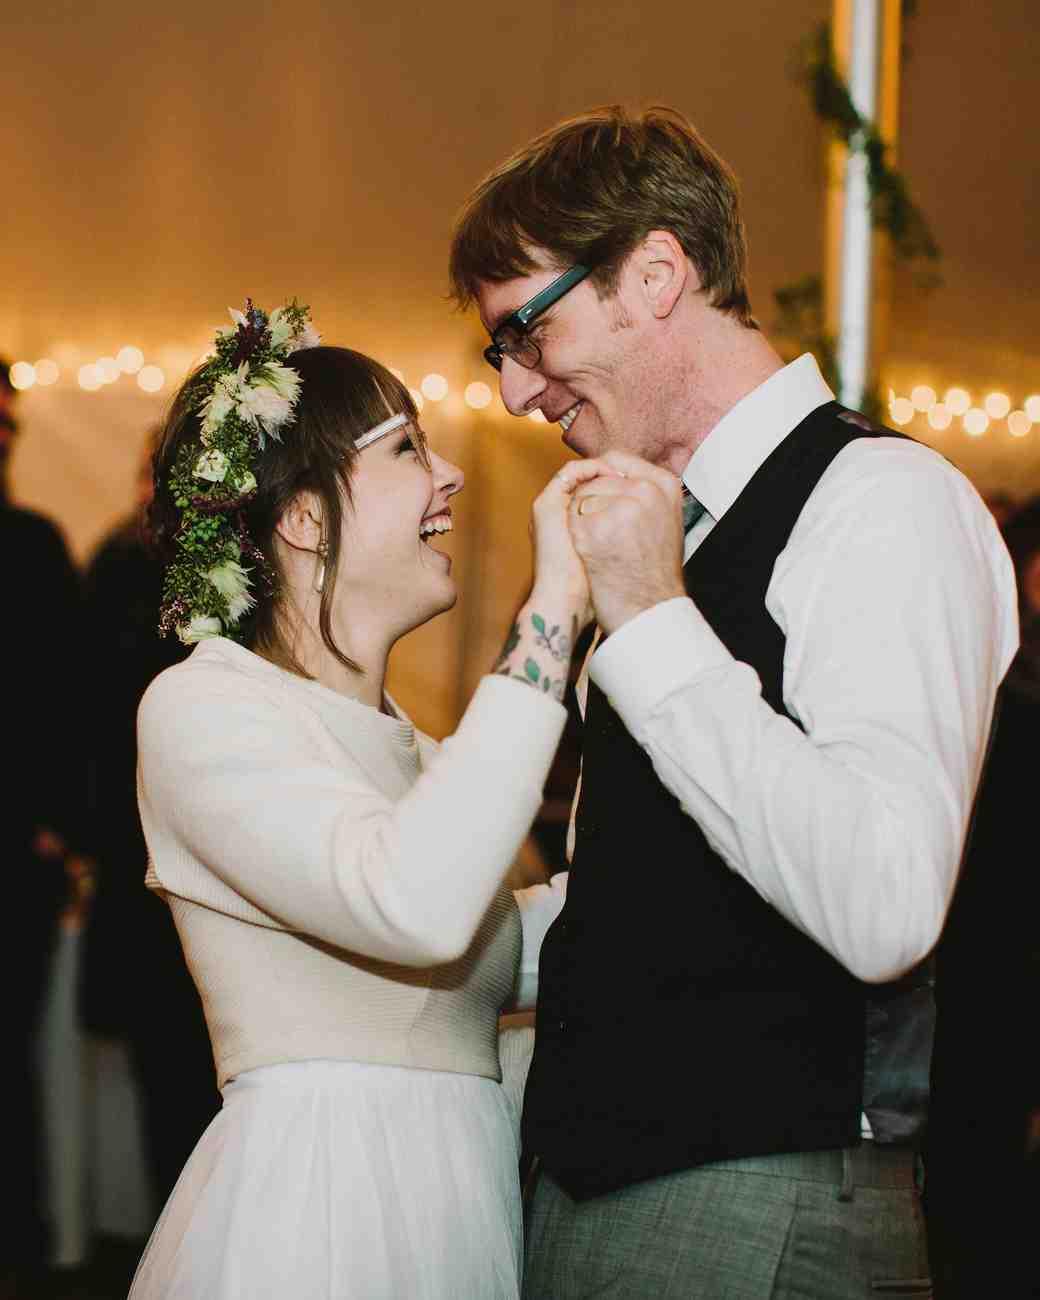 kristen-steve-wedding-firstdance-031-s113058-0616.jpg